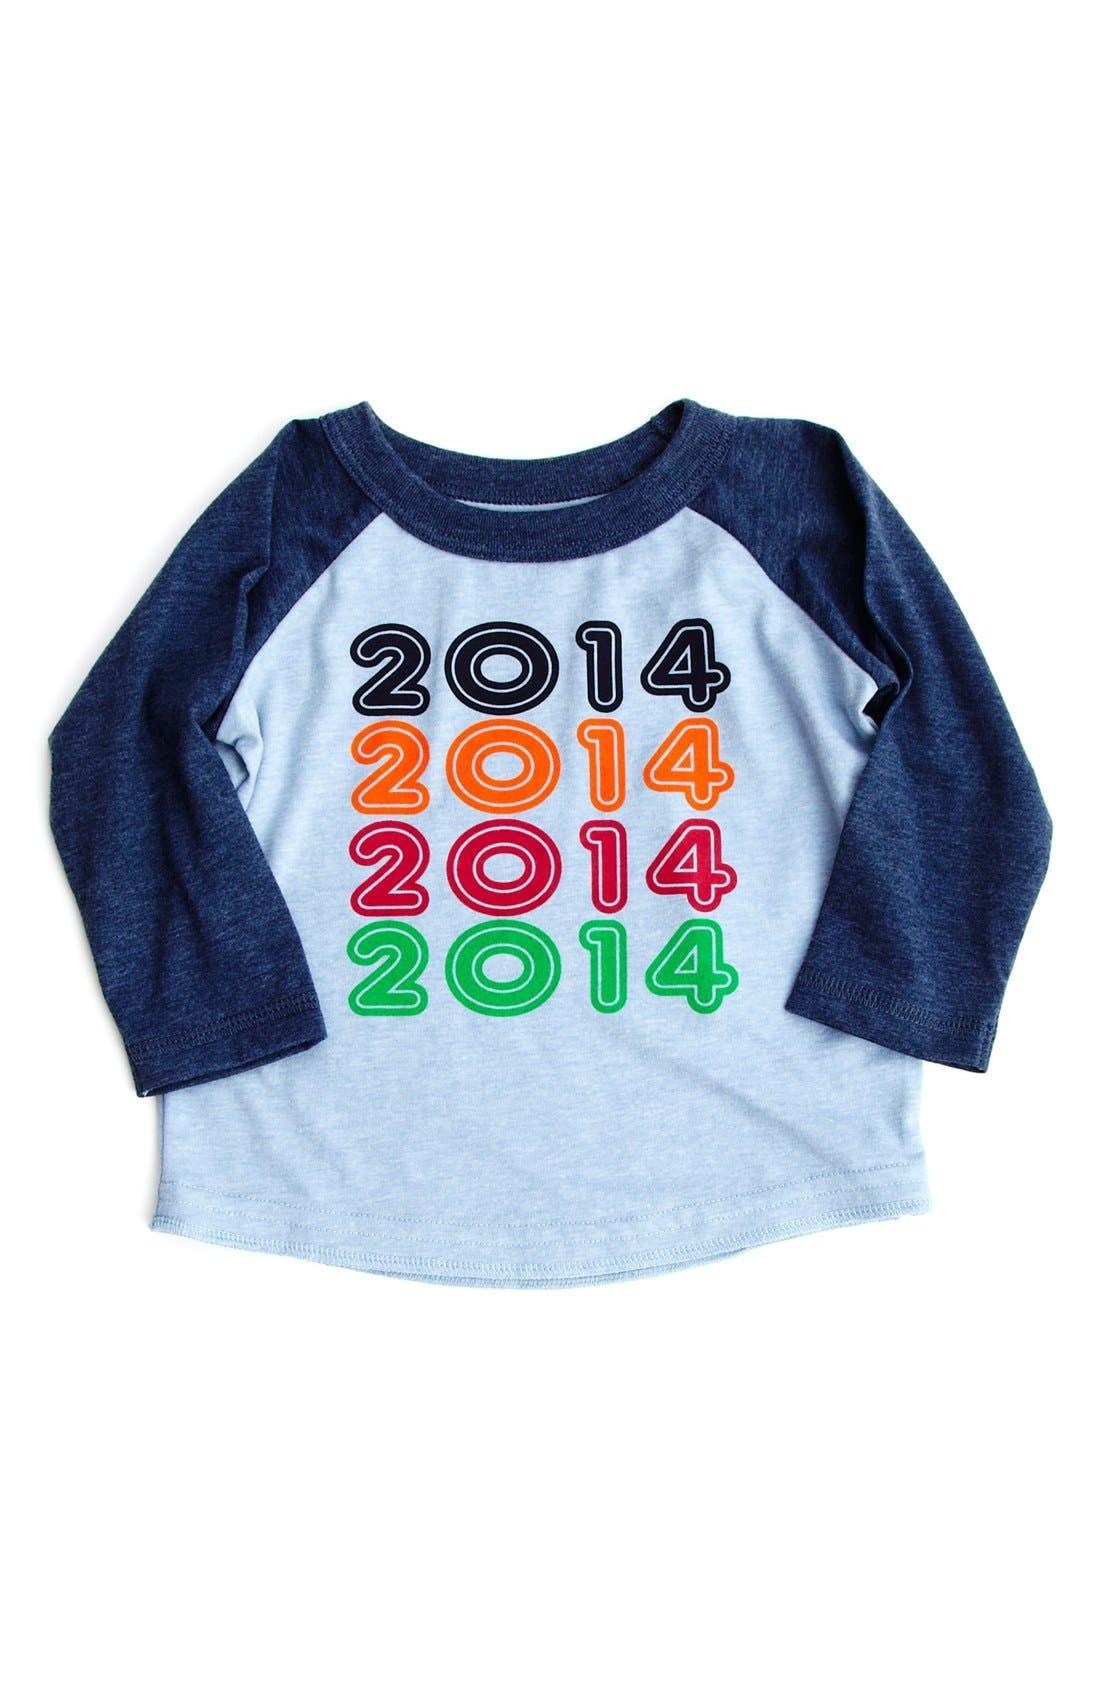 Alternate Image 1 Selected - Peek '2014' Baseball T-Shirt (Baby Boys)